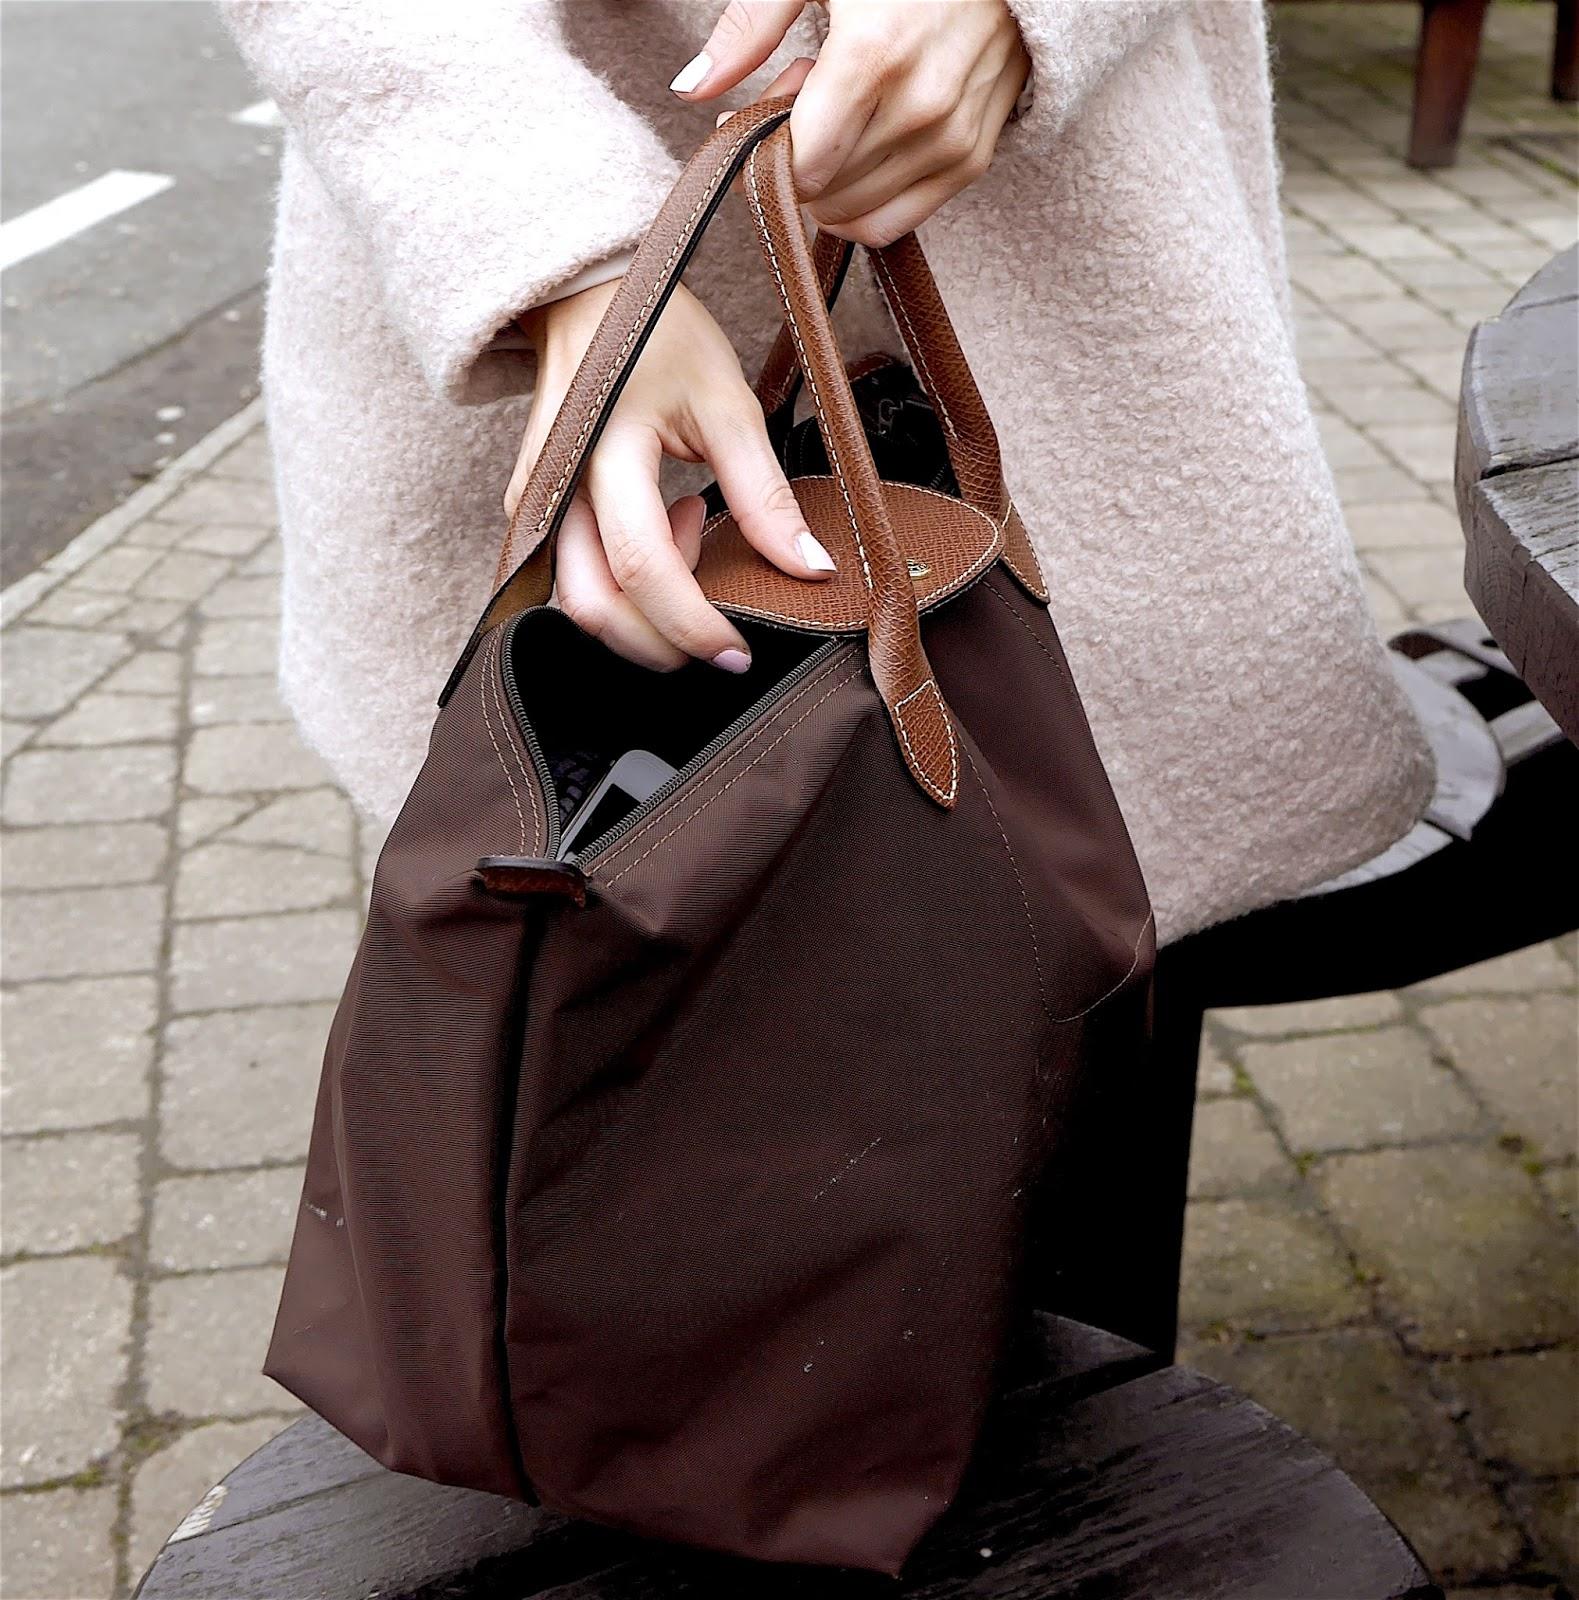 Longchamp Le Pliage Small Tote 3d Handbag Buy Bag Neo 1512578545 Red Bags On Sale My